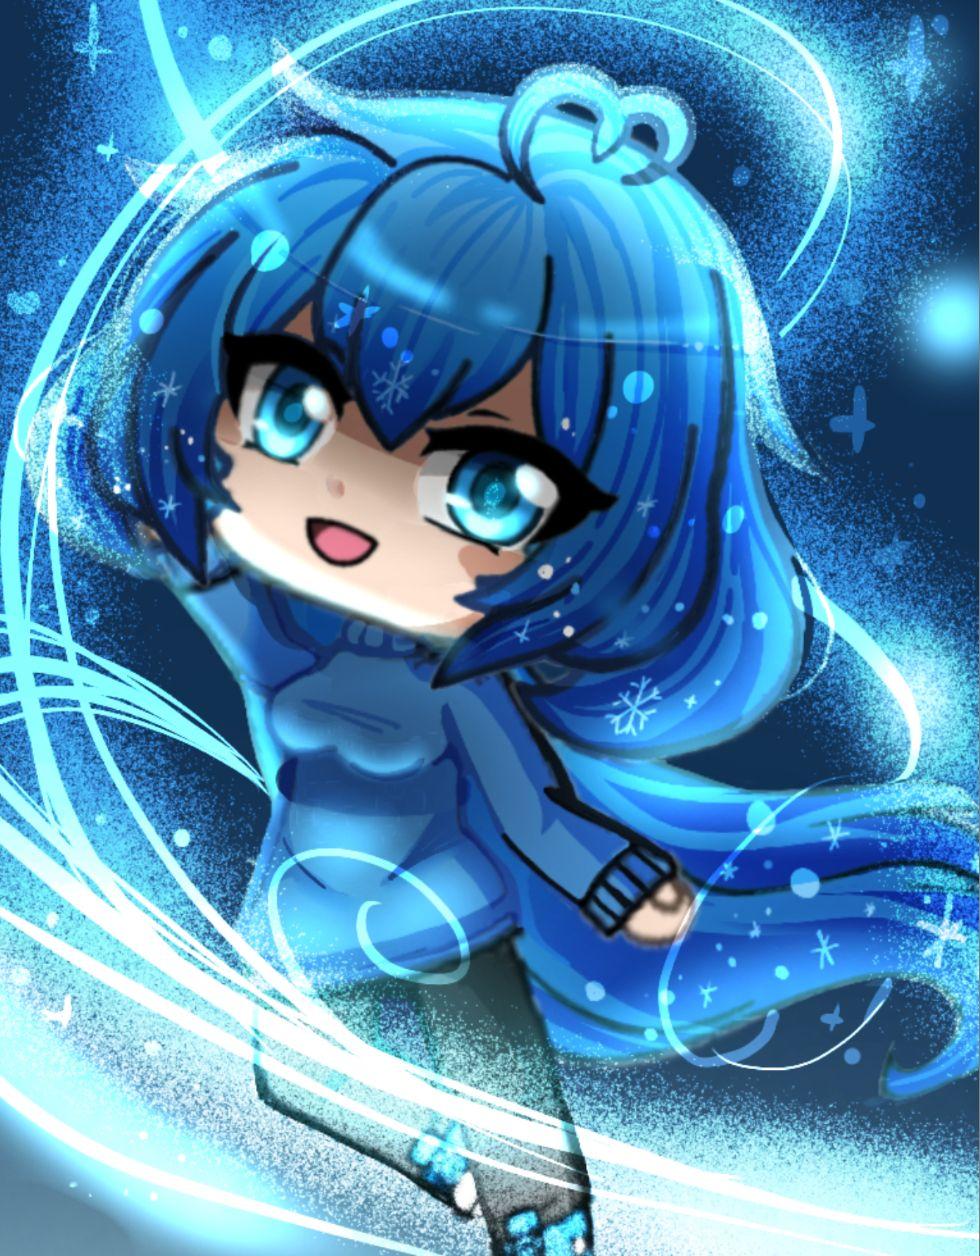 The Cute Anime That I Found Cute Anime Chibi Kawaii Drawings